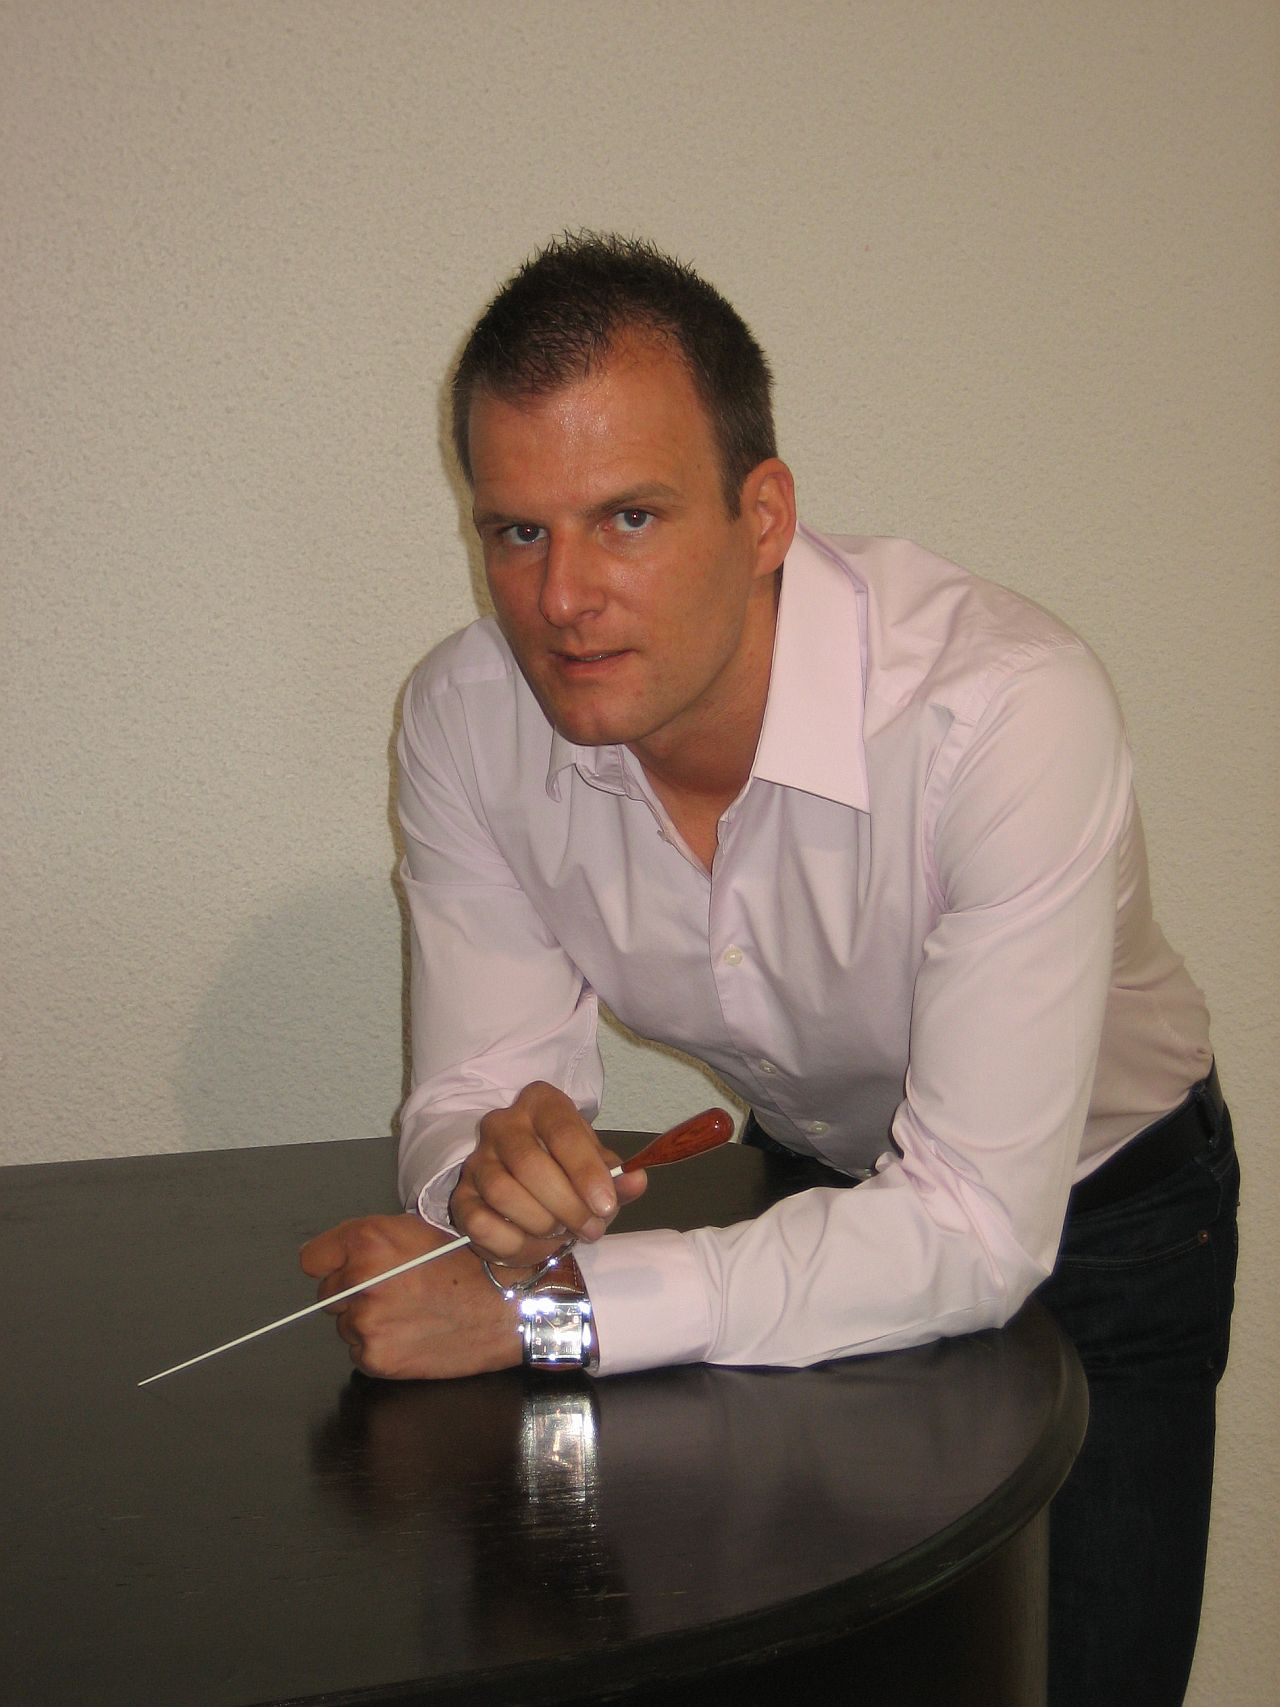 Stadtmusikdirektor Wolfgang Halder